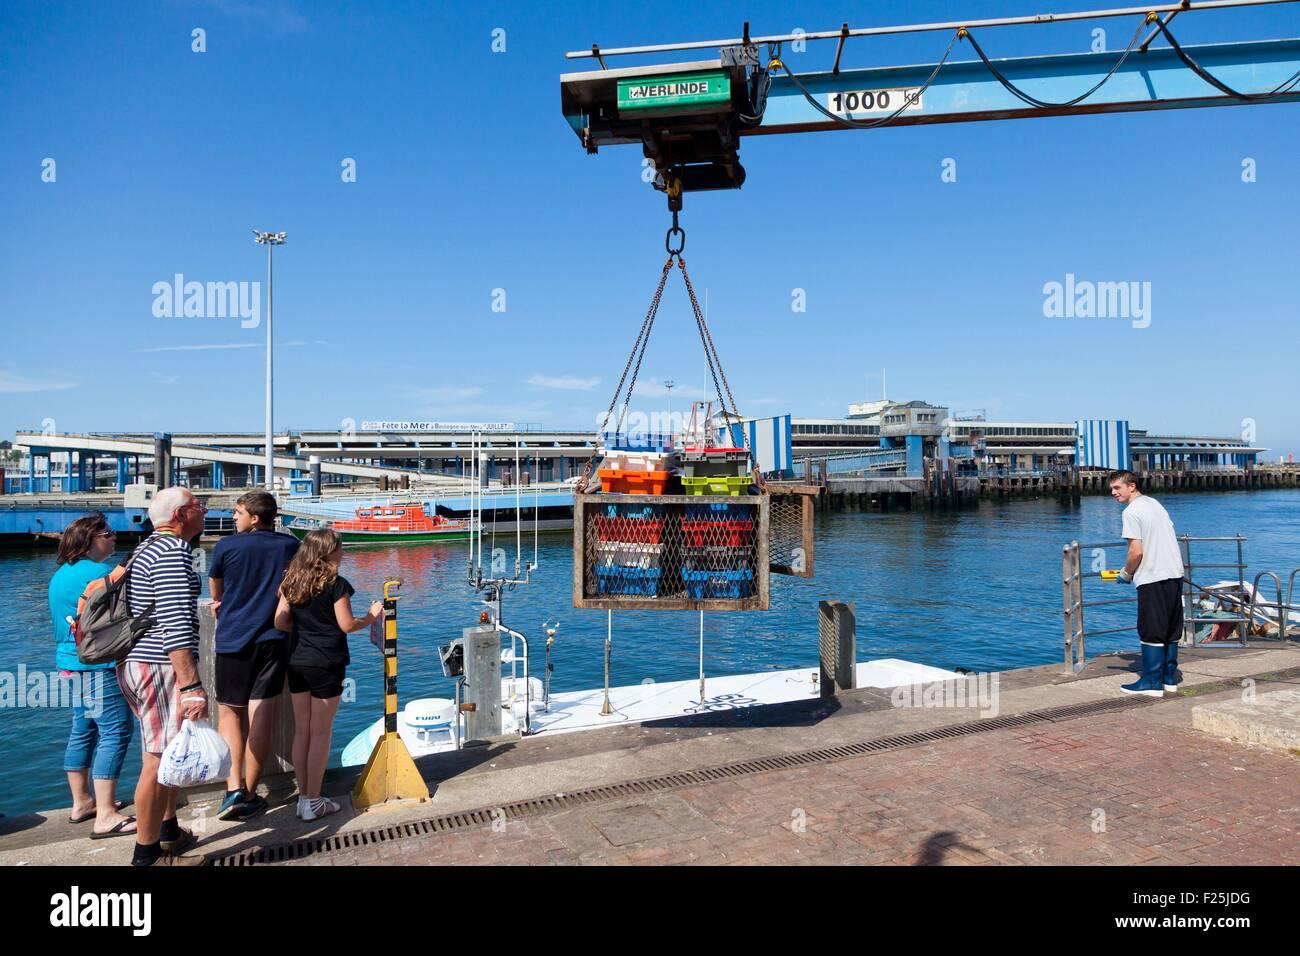 France, Pas de Calais, Boulogne sur mer, returned trawlers unloading boxes of fish fishing - Stock Image